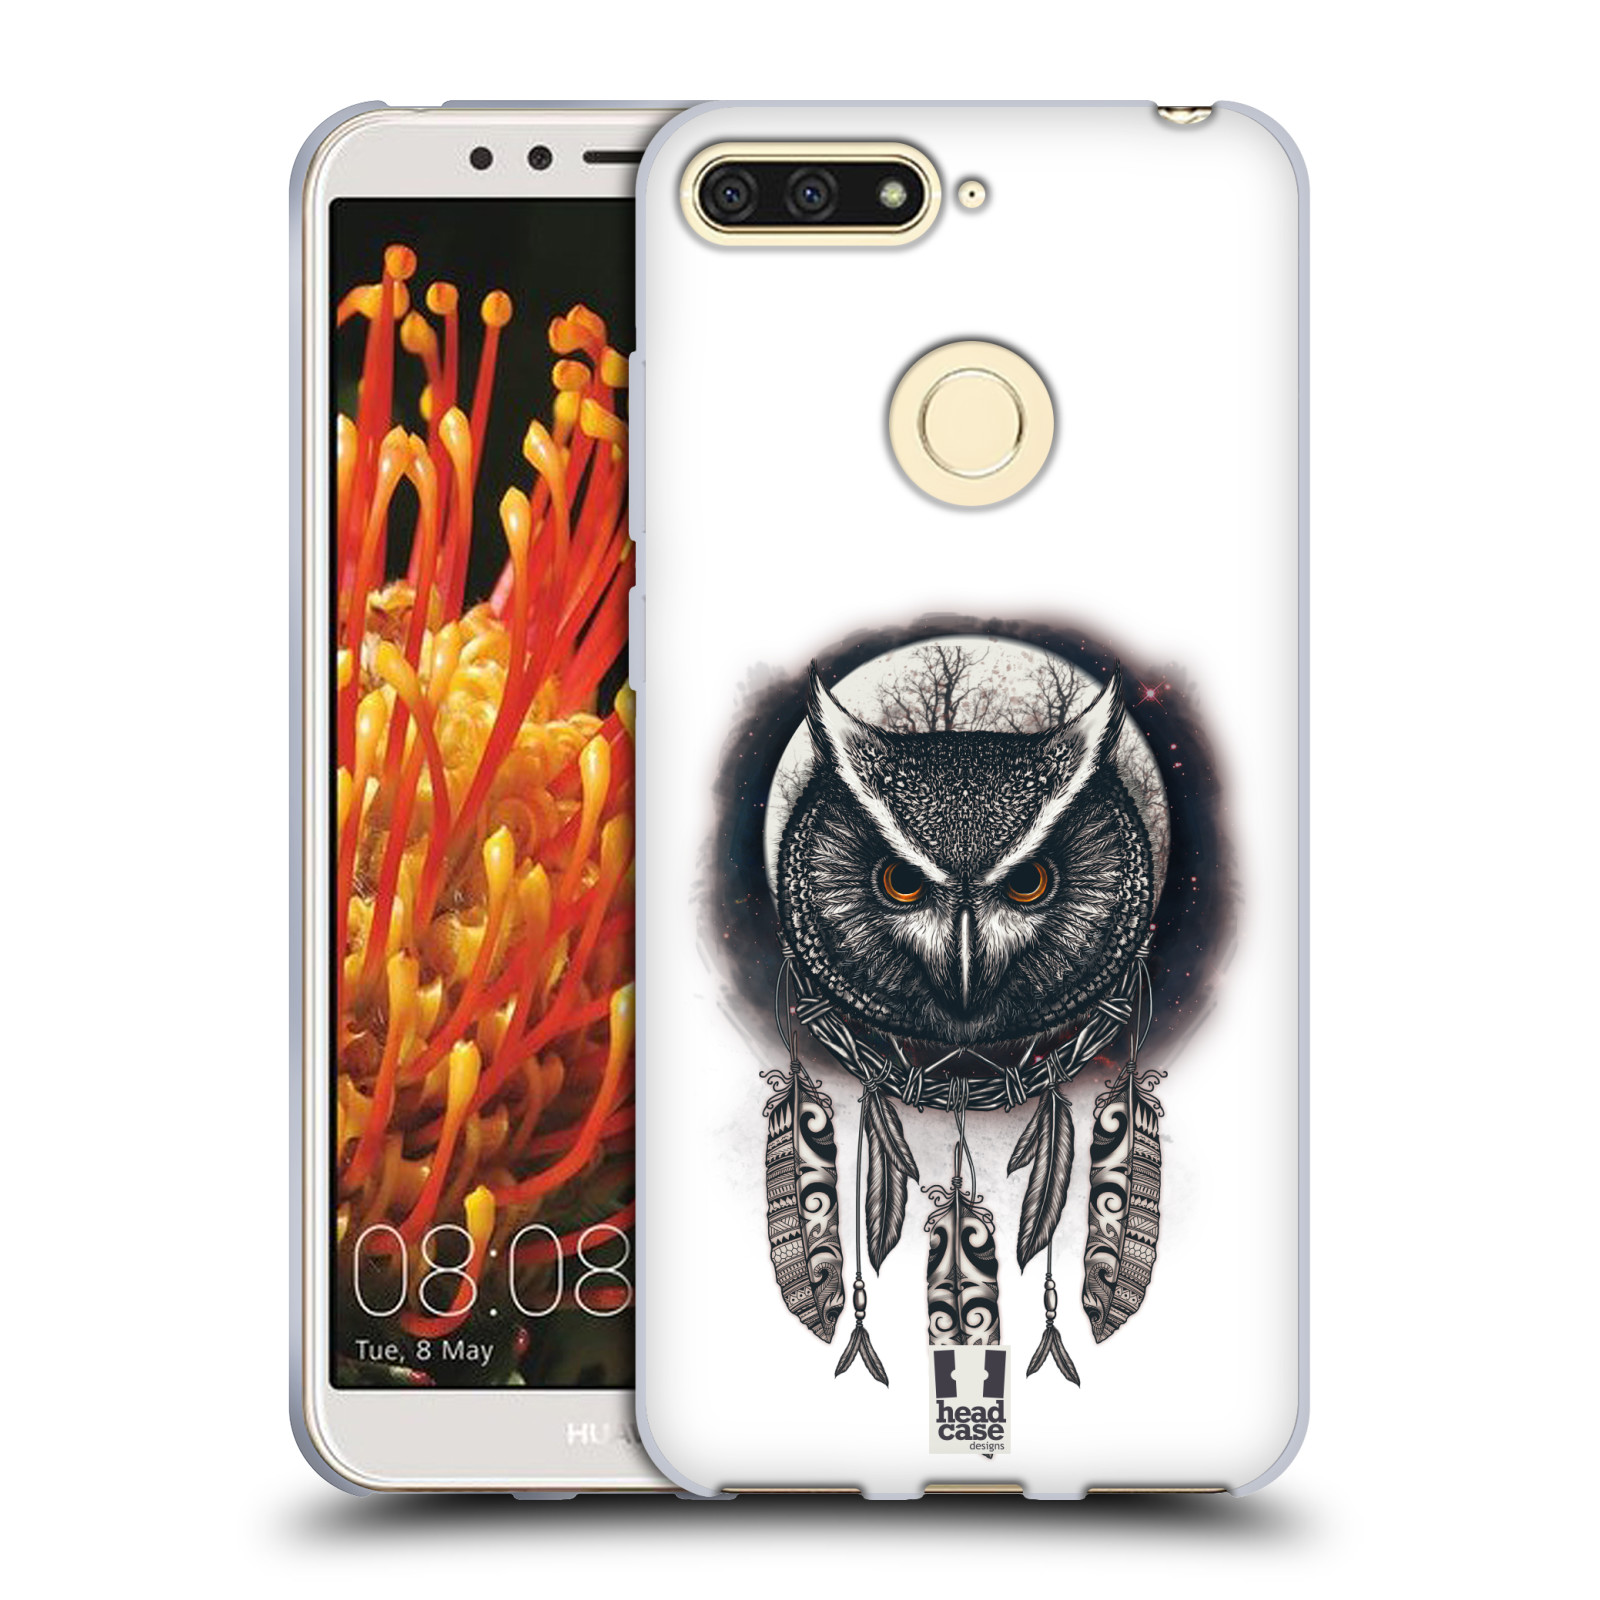 Silikonové pouzdro na mobil Huawei Y6 Prime (2018) - Head Case - Soví lapač